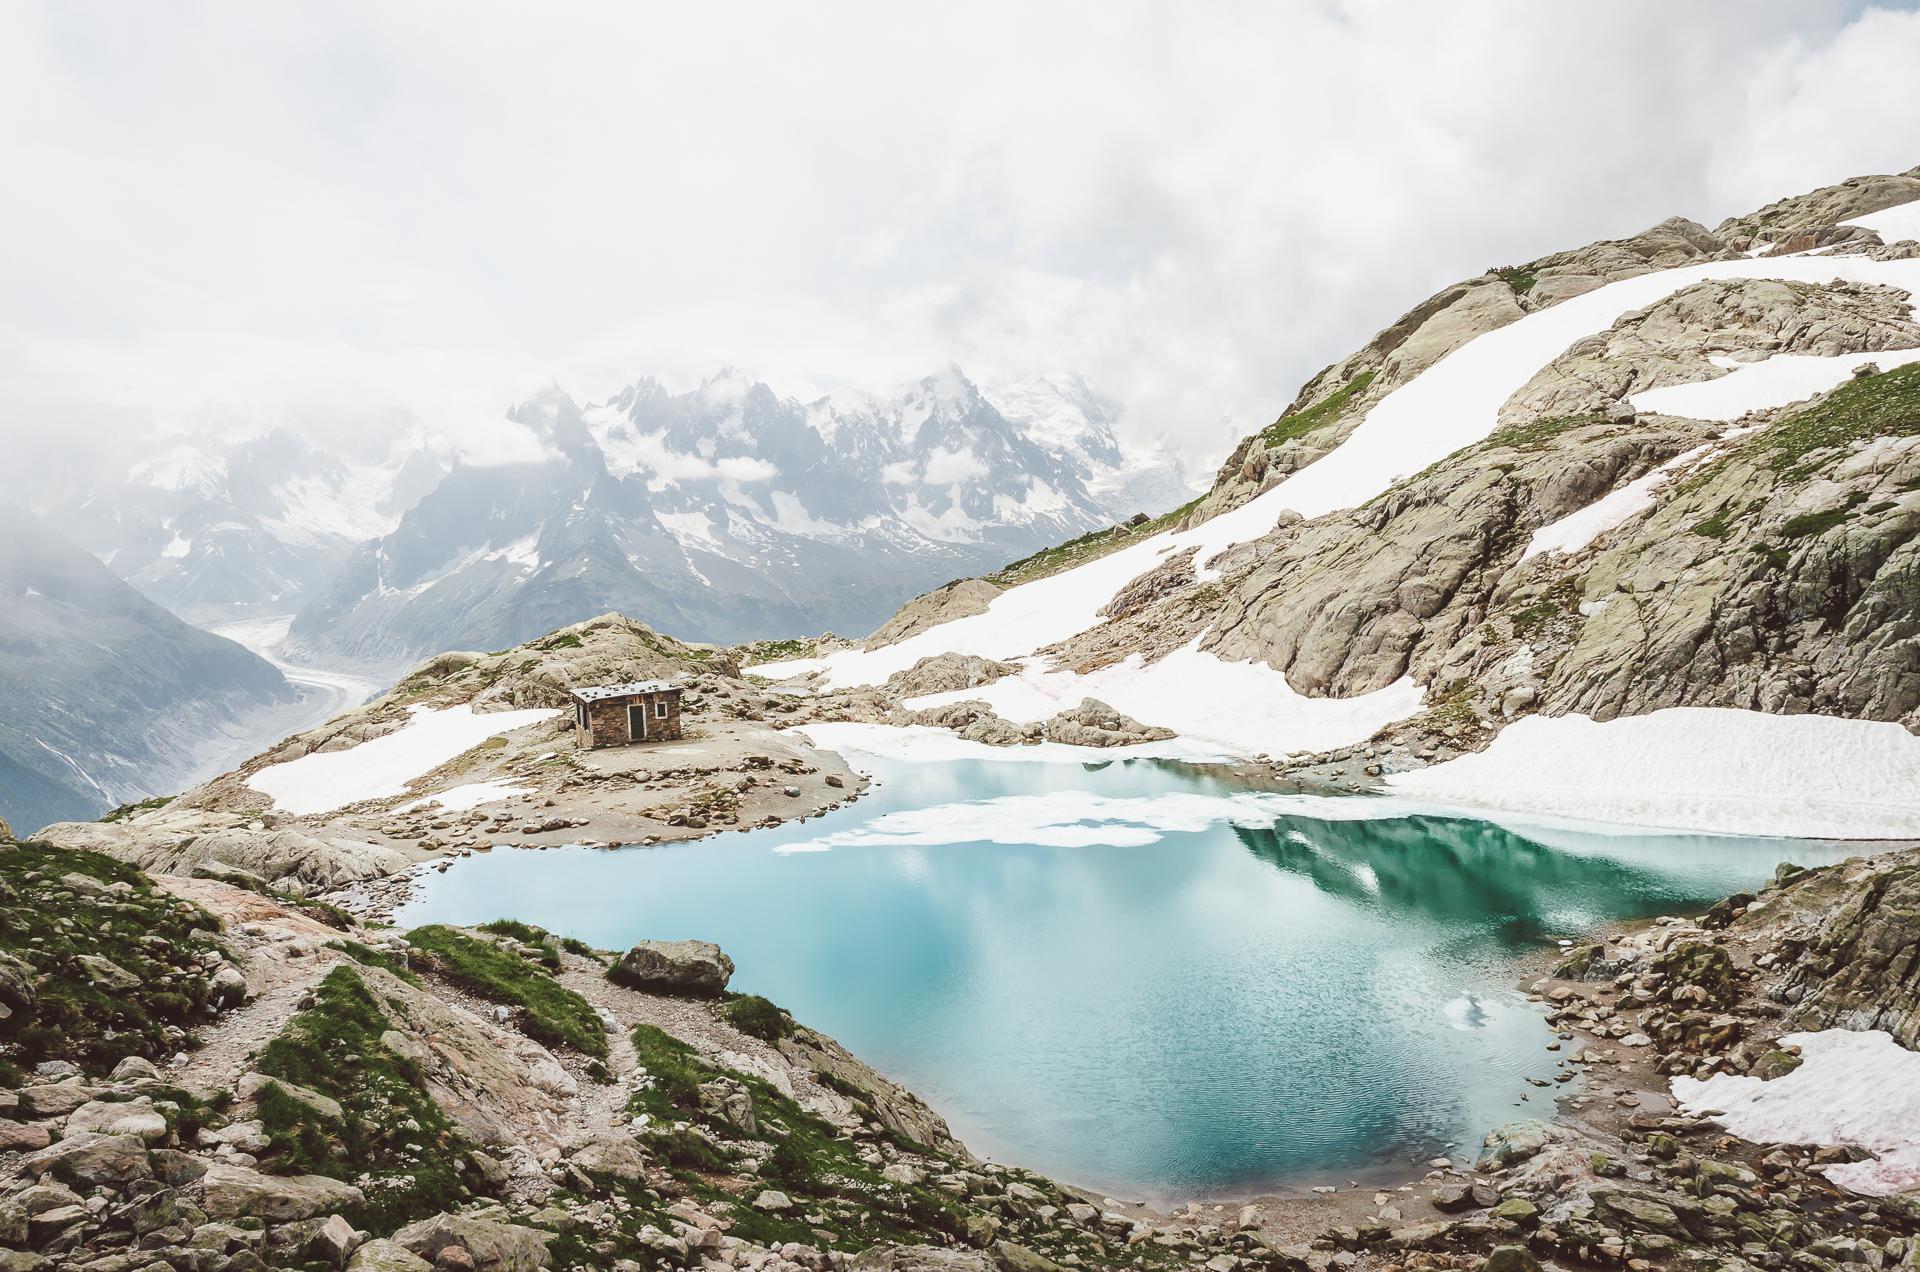 Chamonix, Lac Blanc, Alps